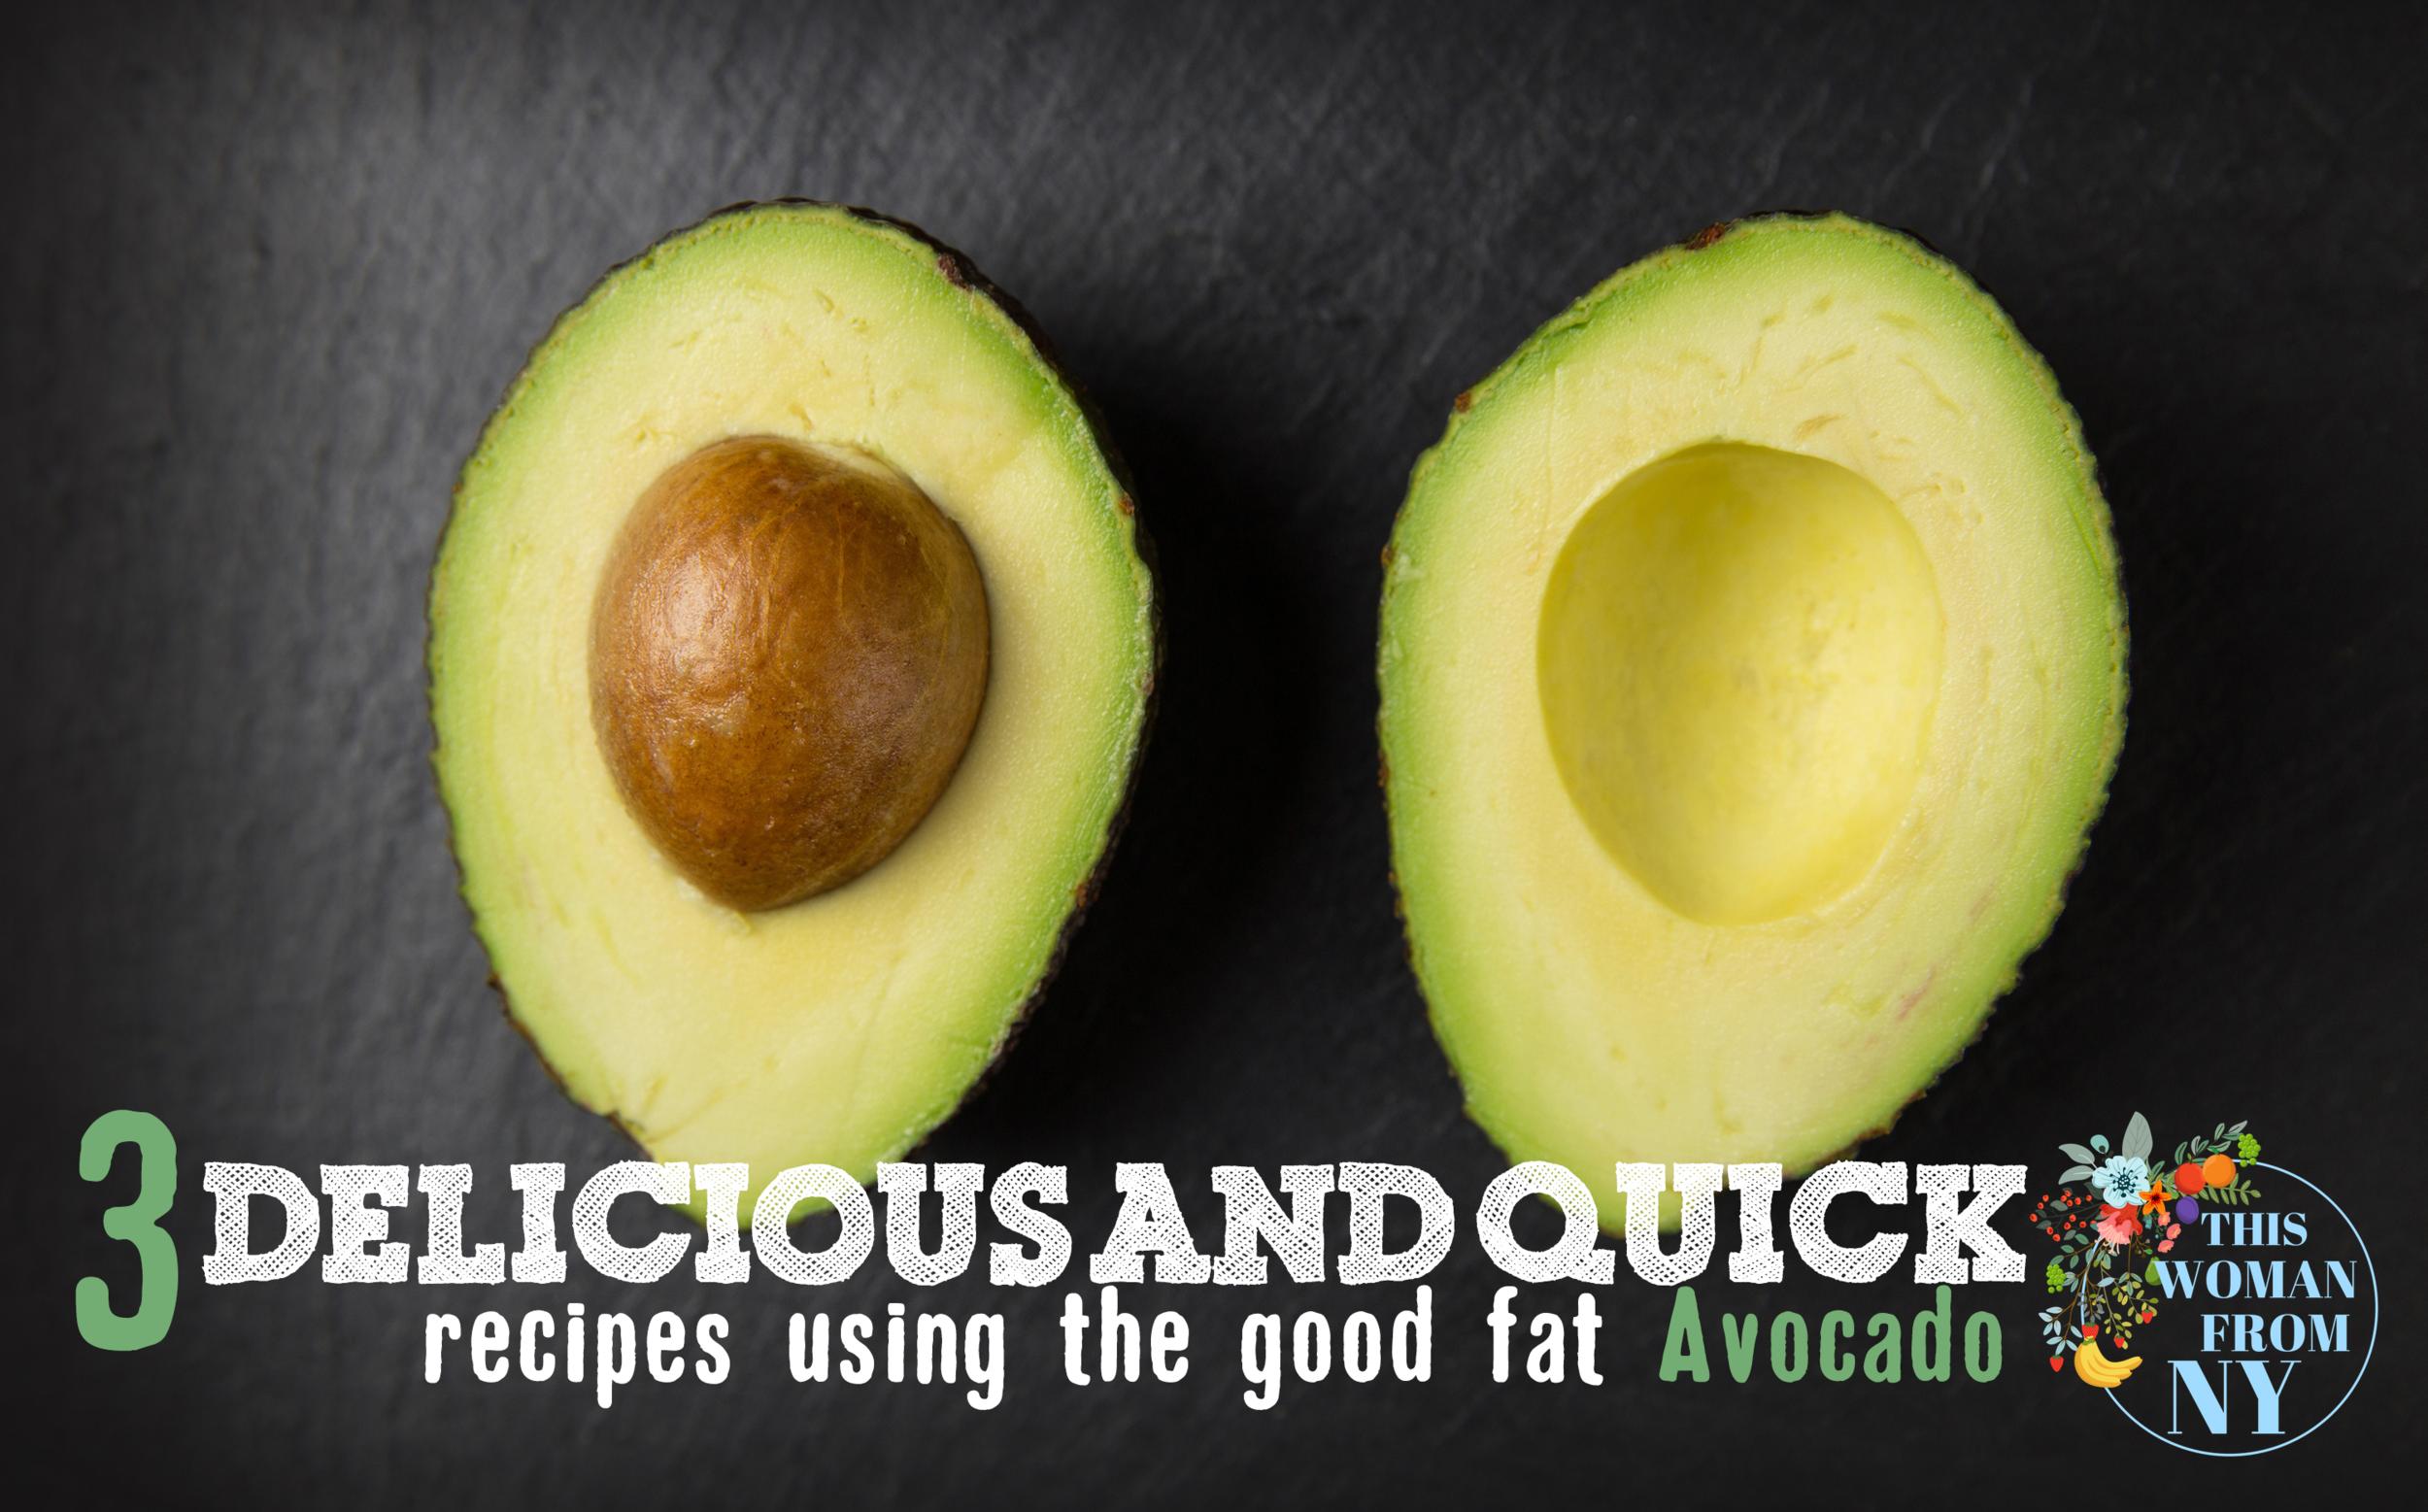 Source |Foodie Factor